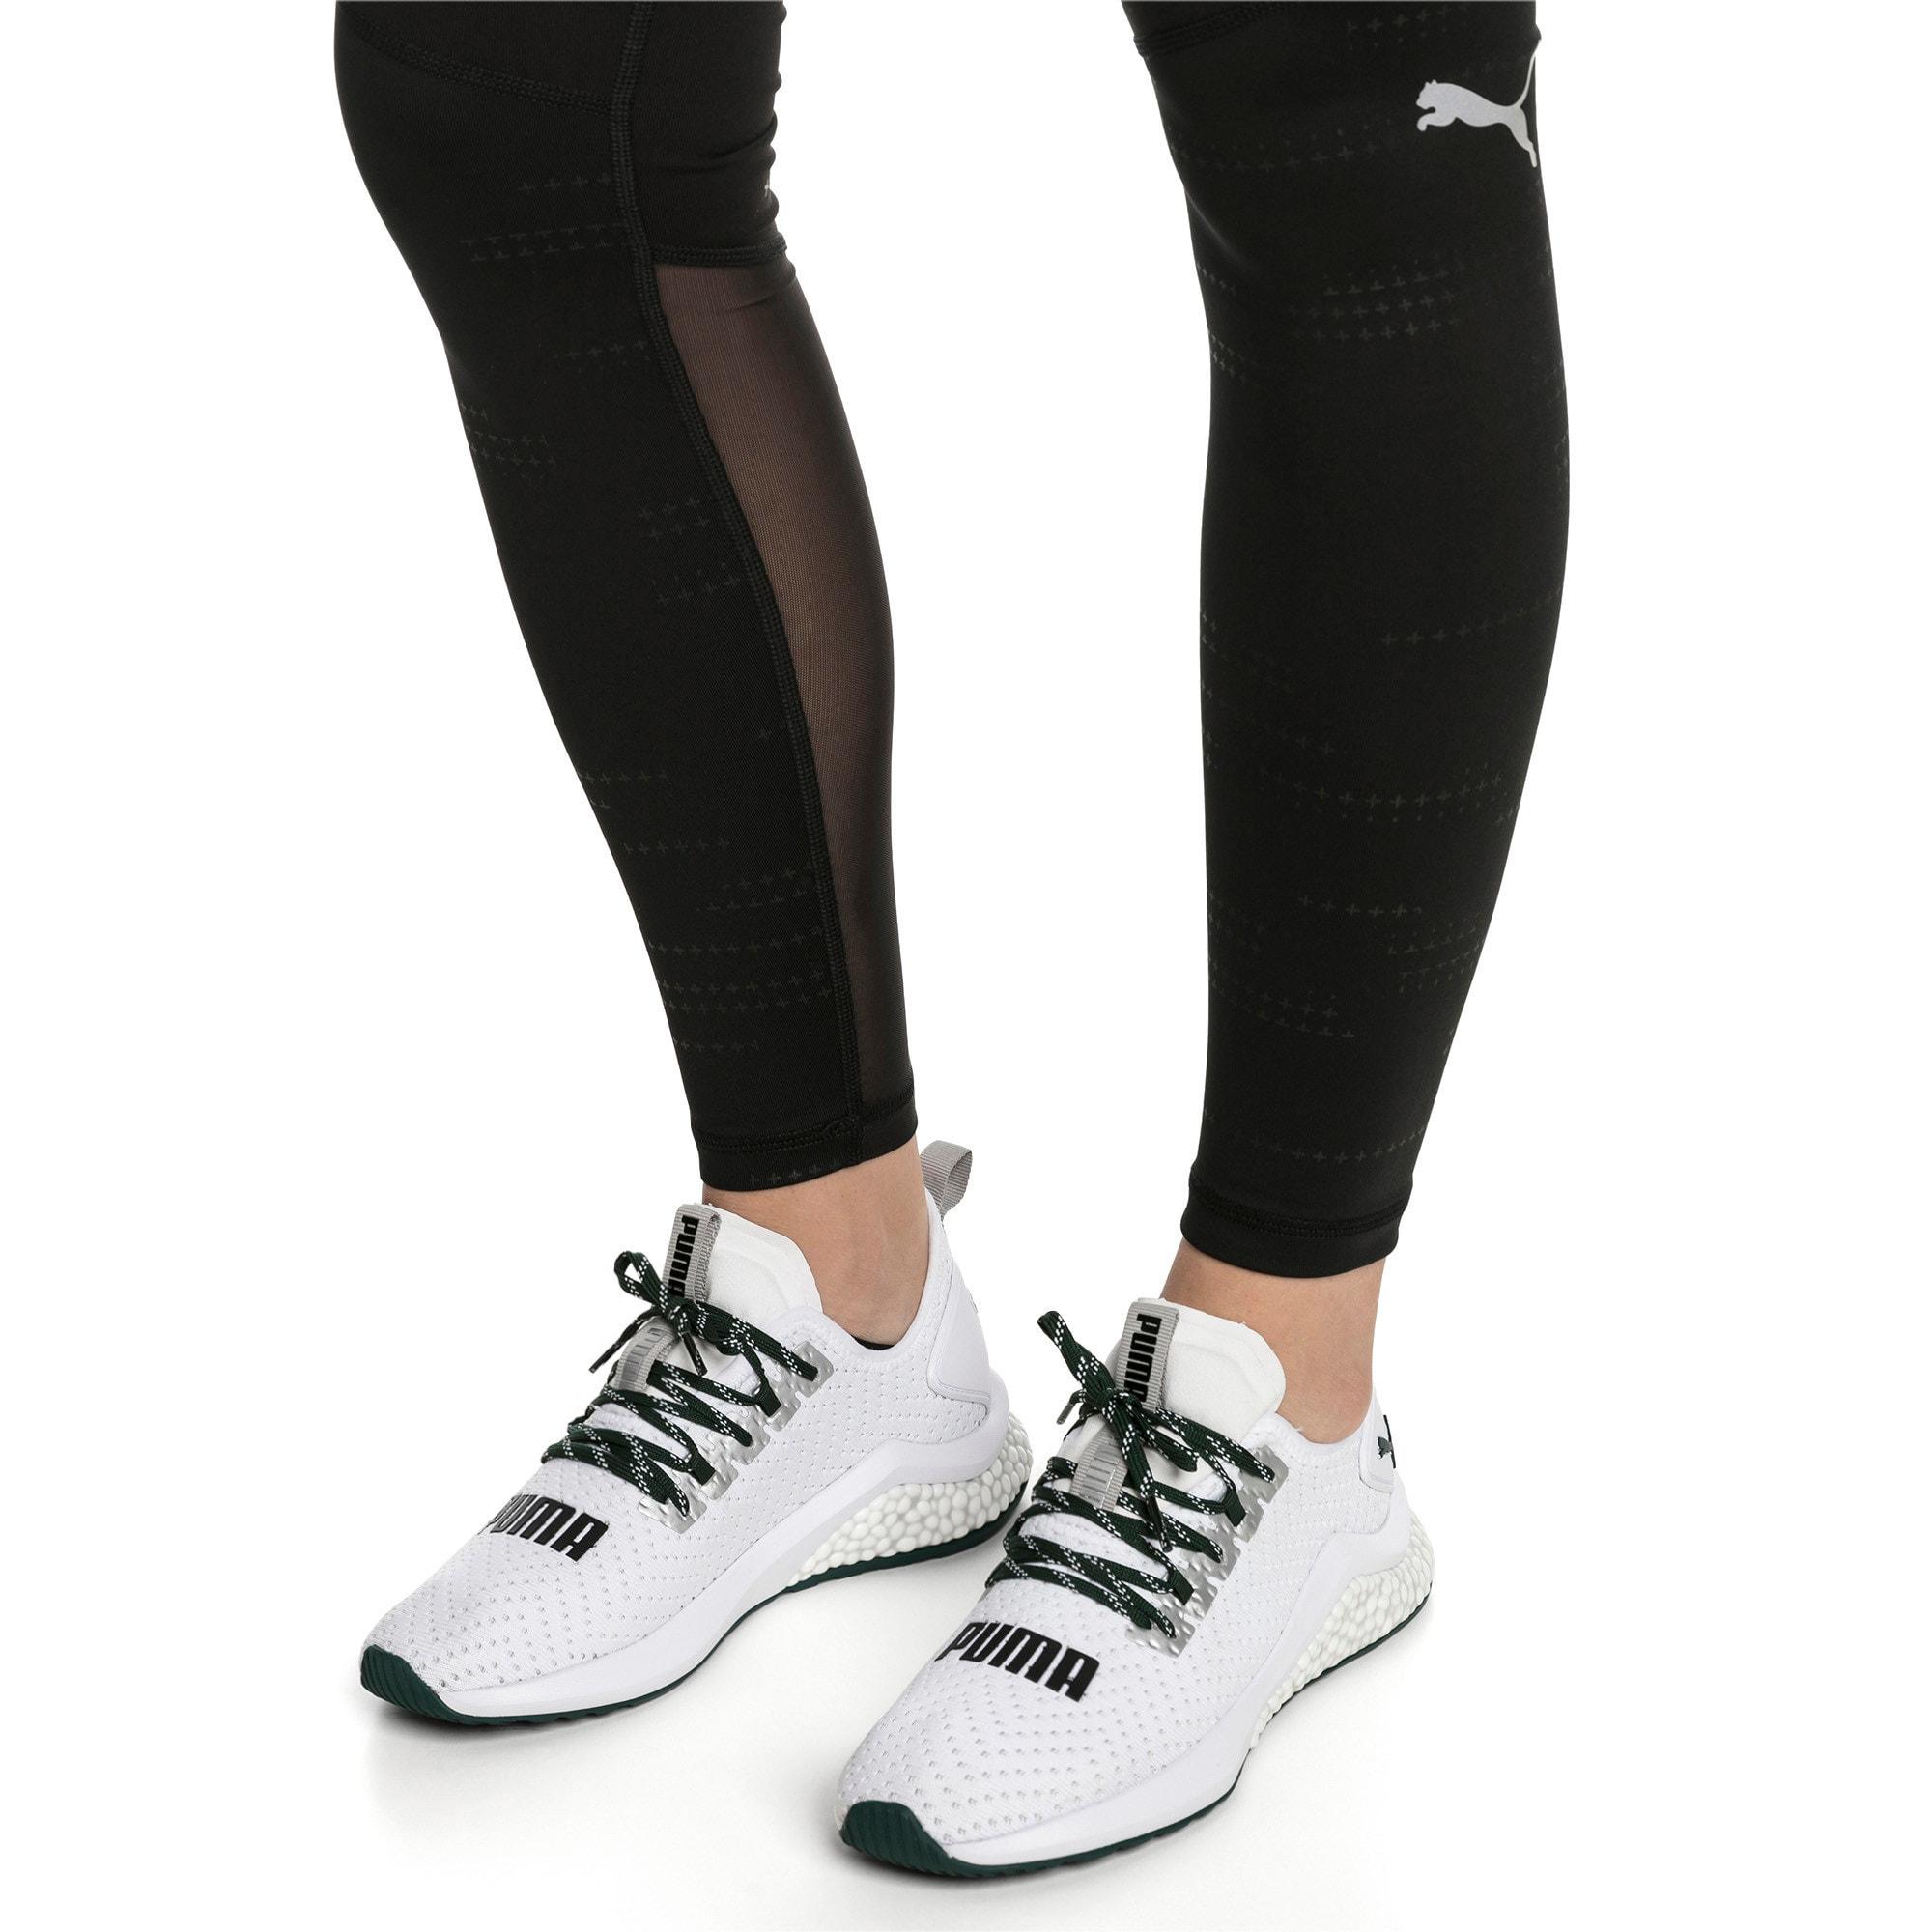 Thumbnail 2 van HYBRID NX Trailblazer hardloopschoenen voor vrouwen, Puma White-Ponderosa Pine, medium